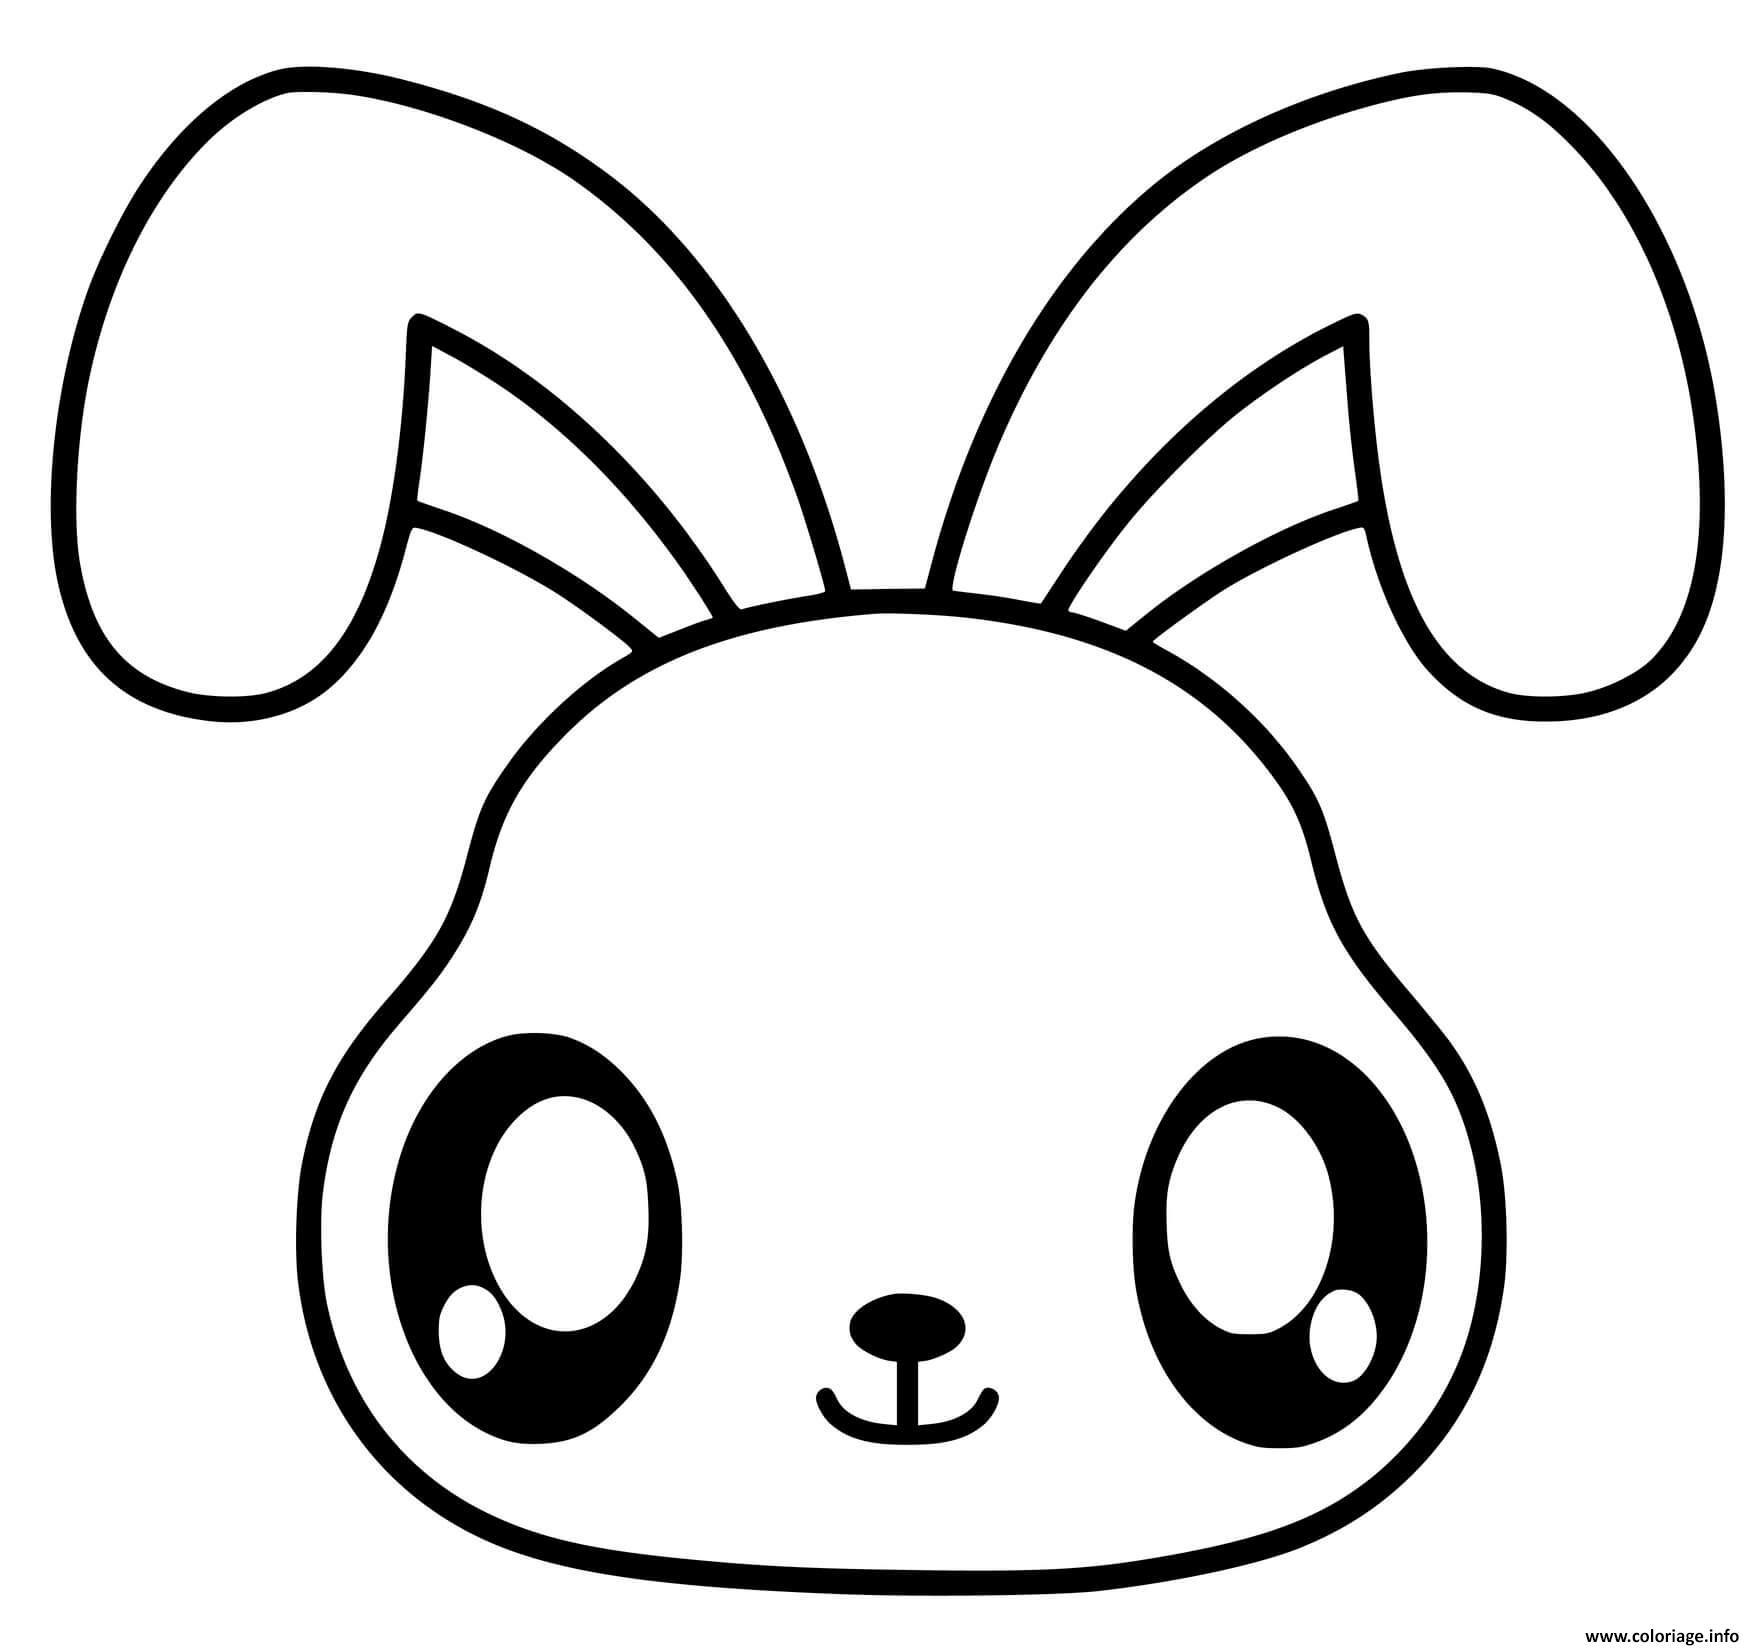 Dessin lapin kawaii facile maternelle Coloriage Gratuit à Imprimer